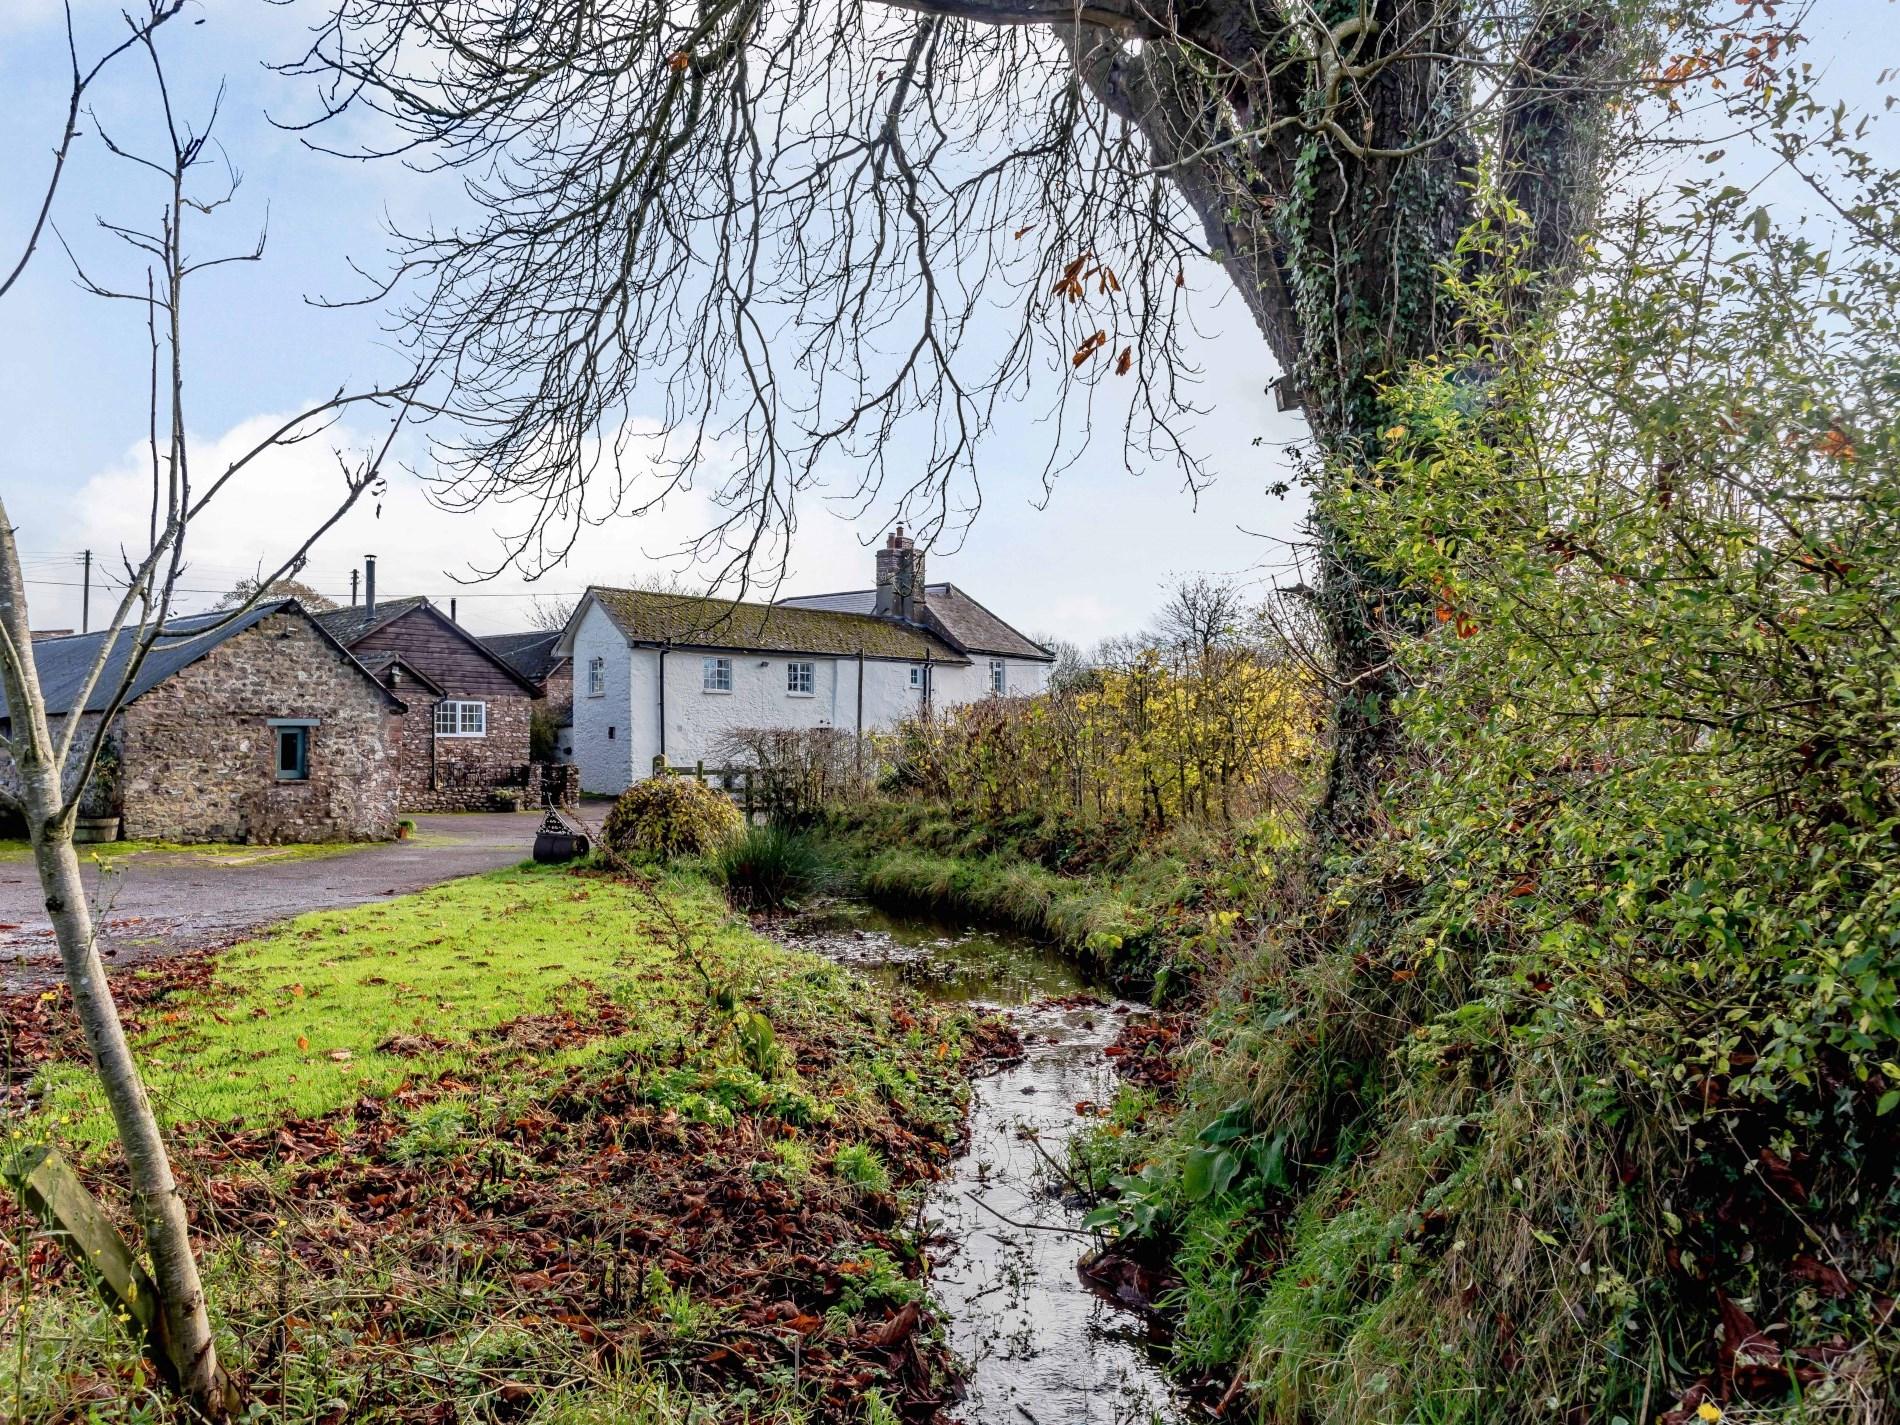 1 Bedroom Cottage in Honiton, Devon